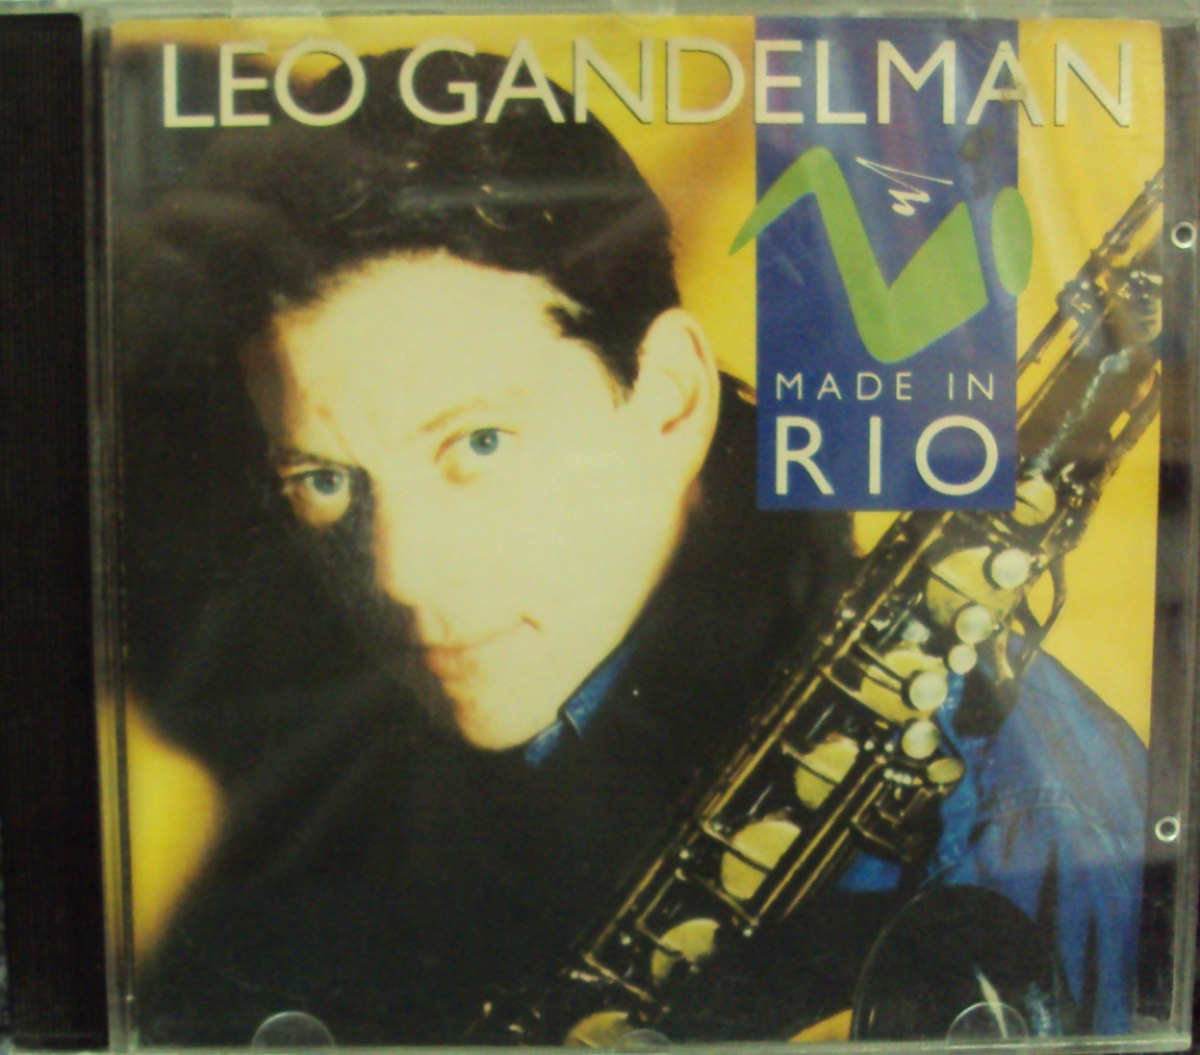 leo gandelman made in rio